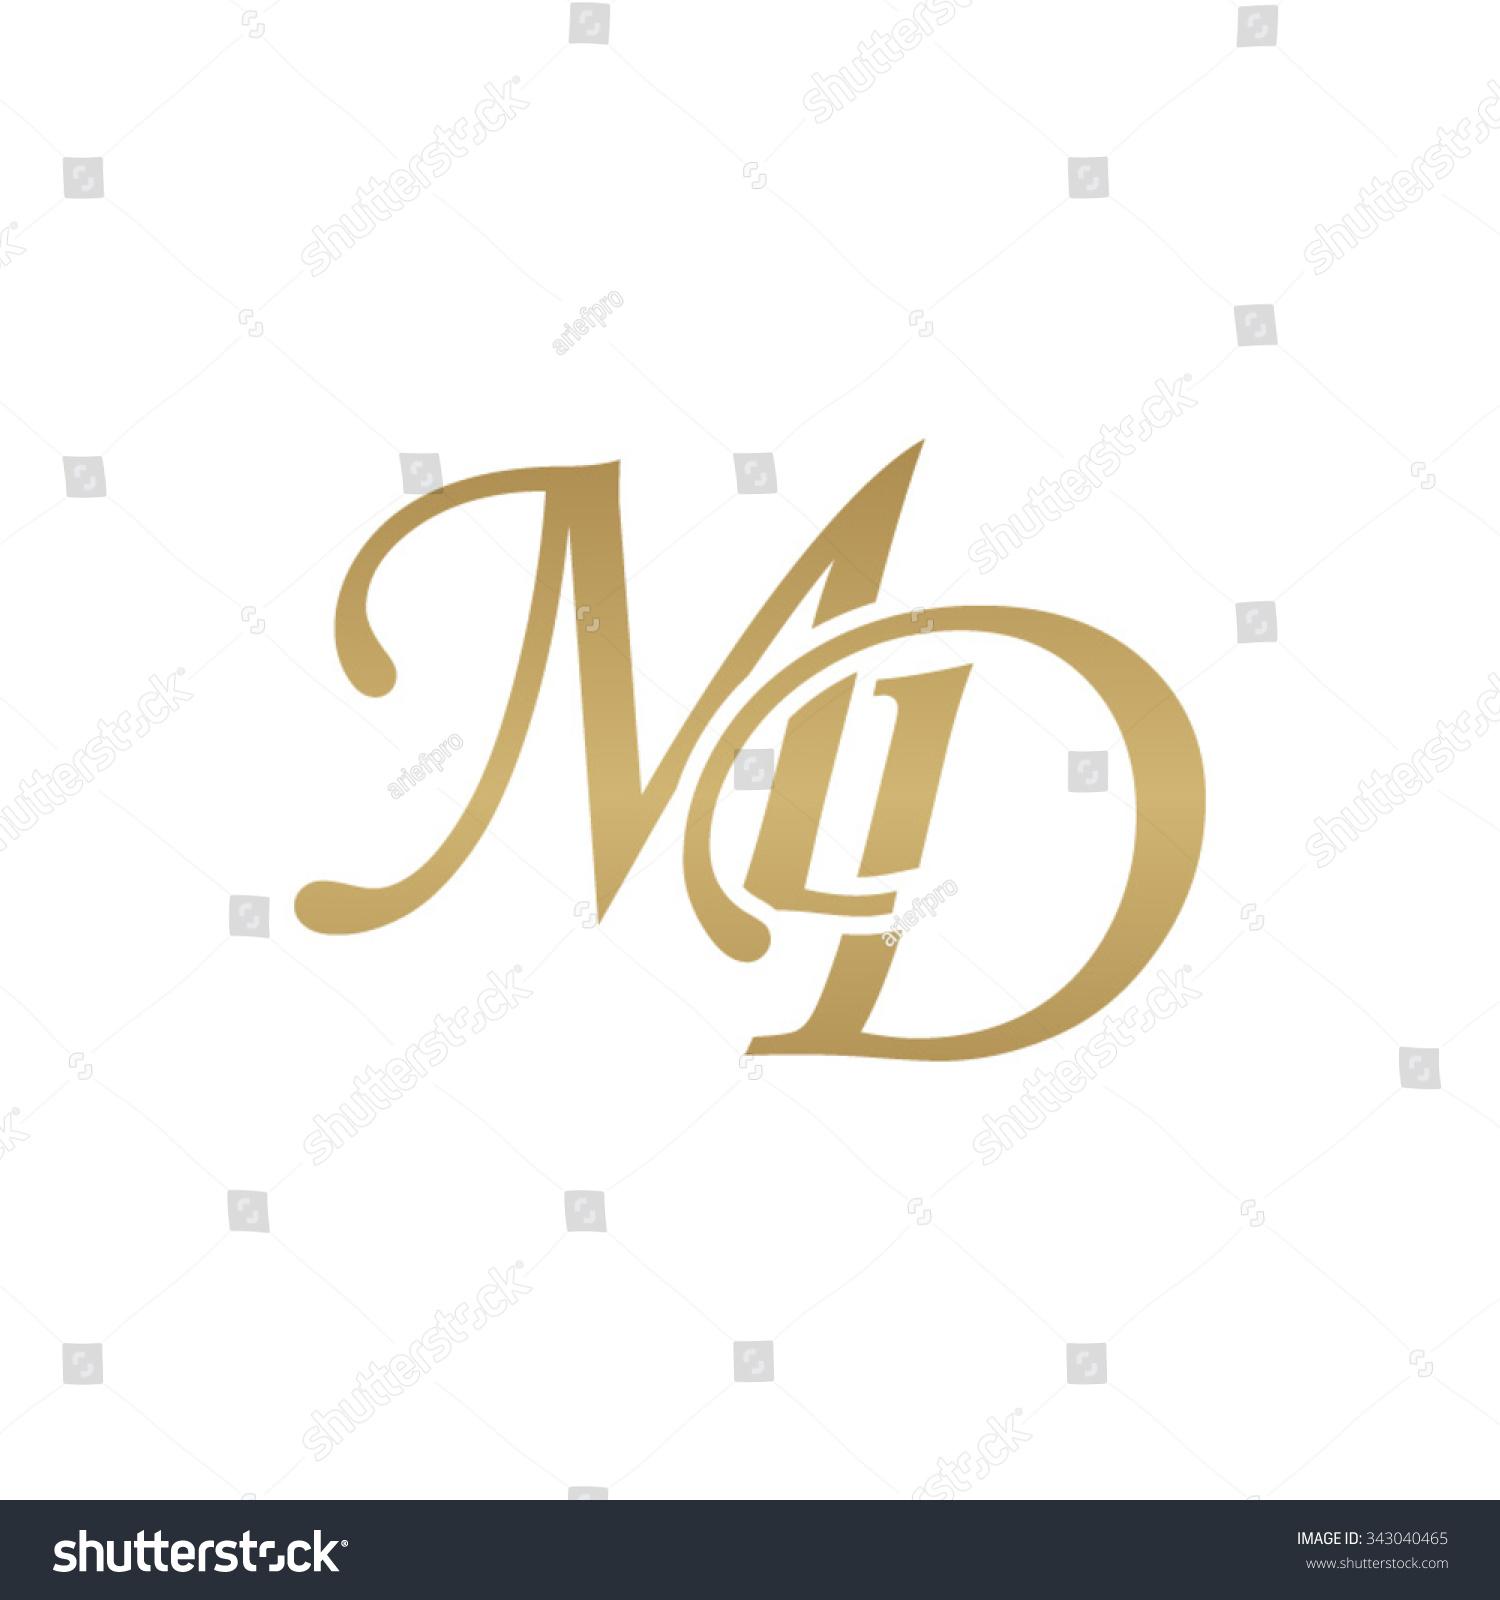 Md Initial Monogram Logo Stock Vector Illustration 343040465 ...